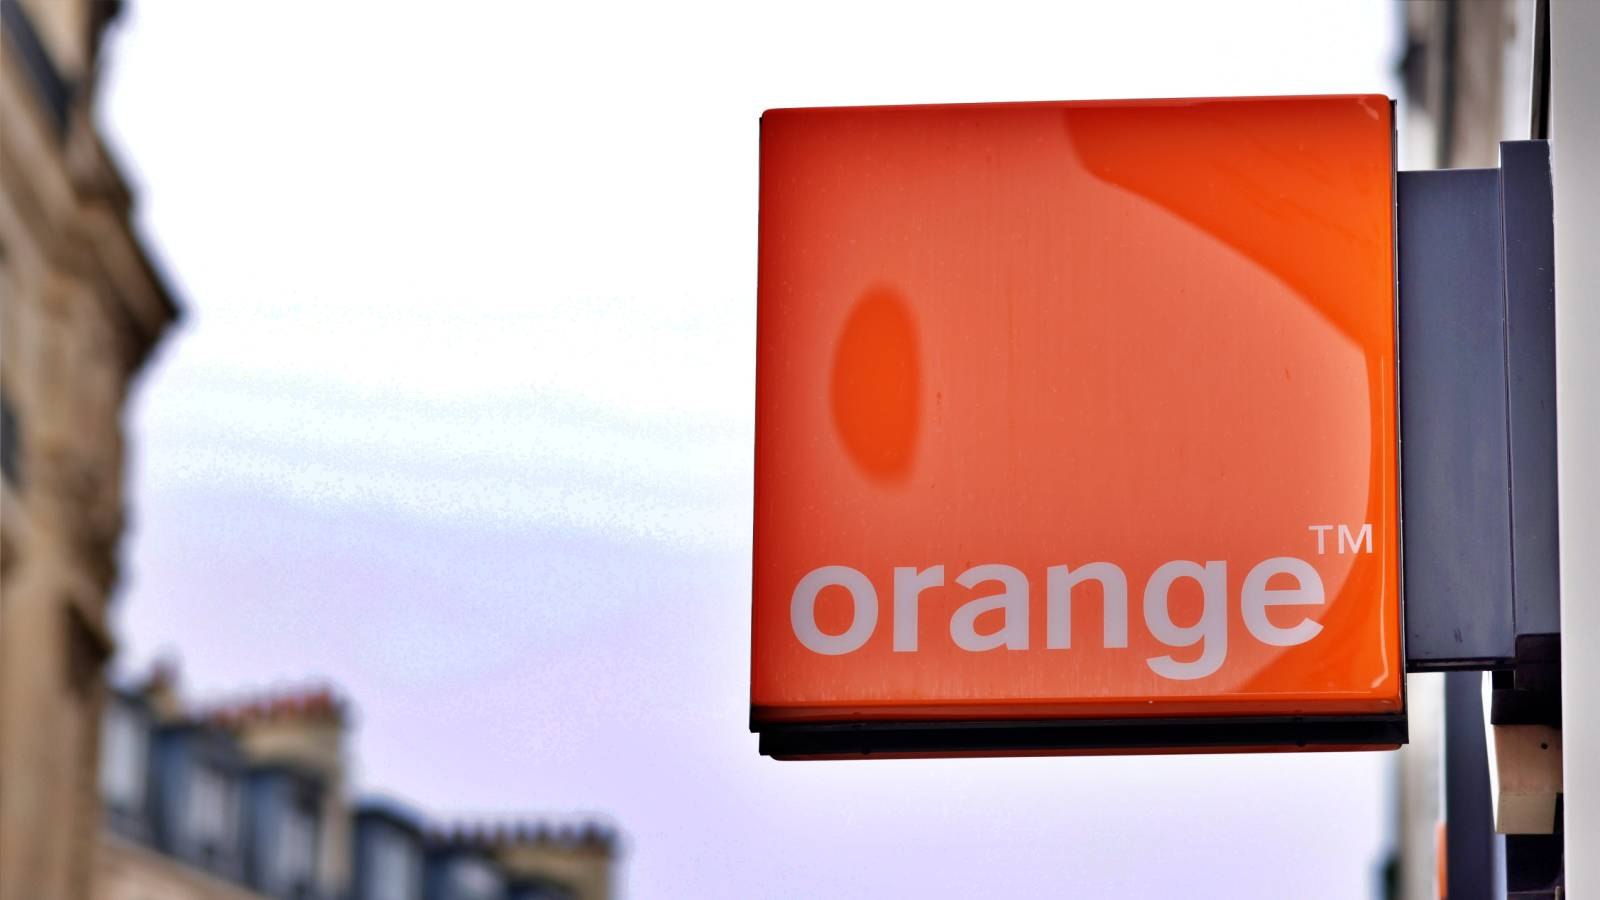 Orange zilele